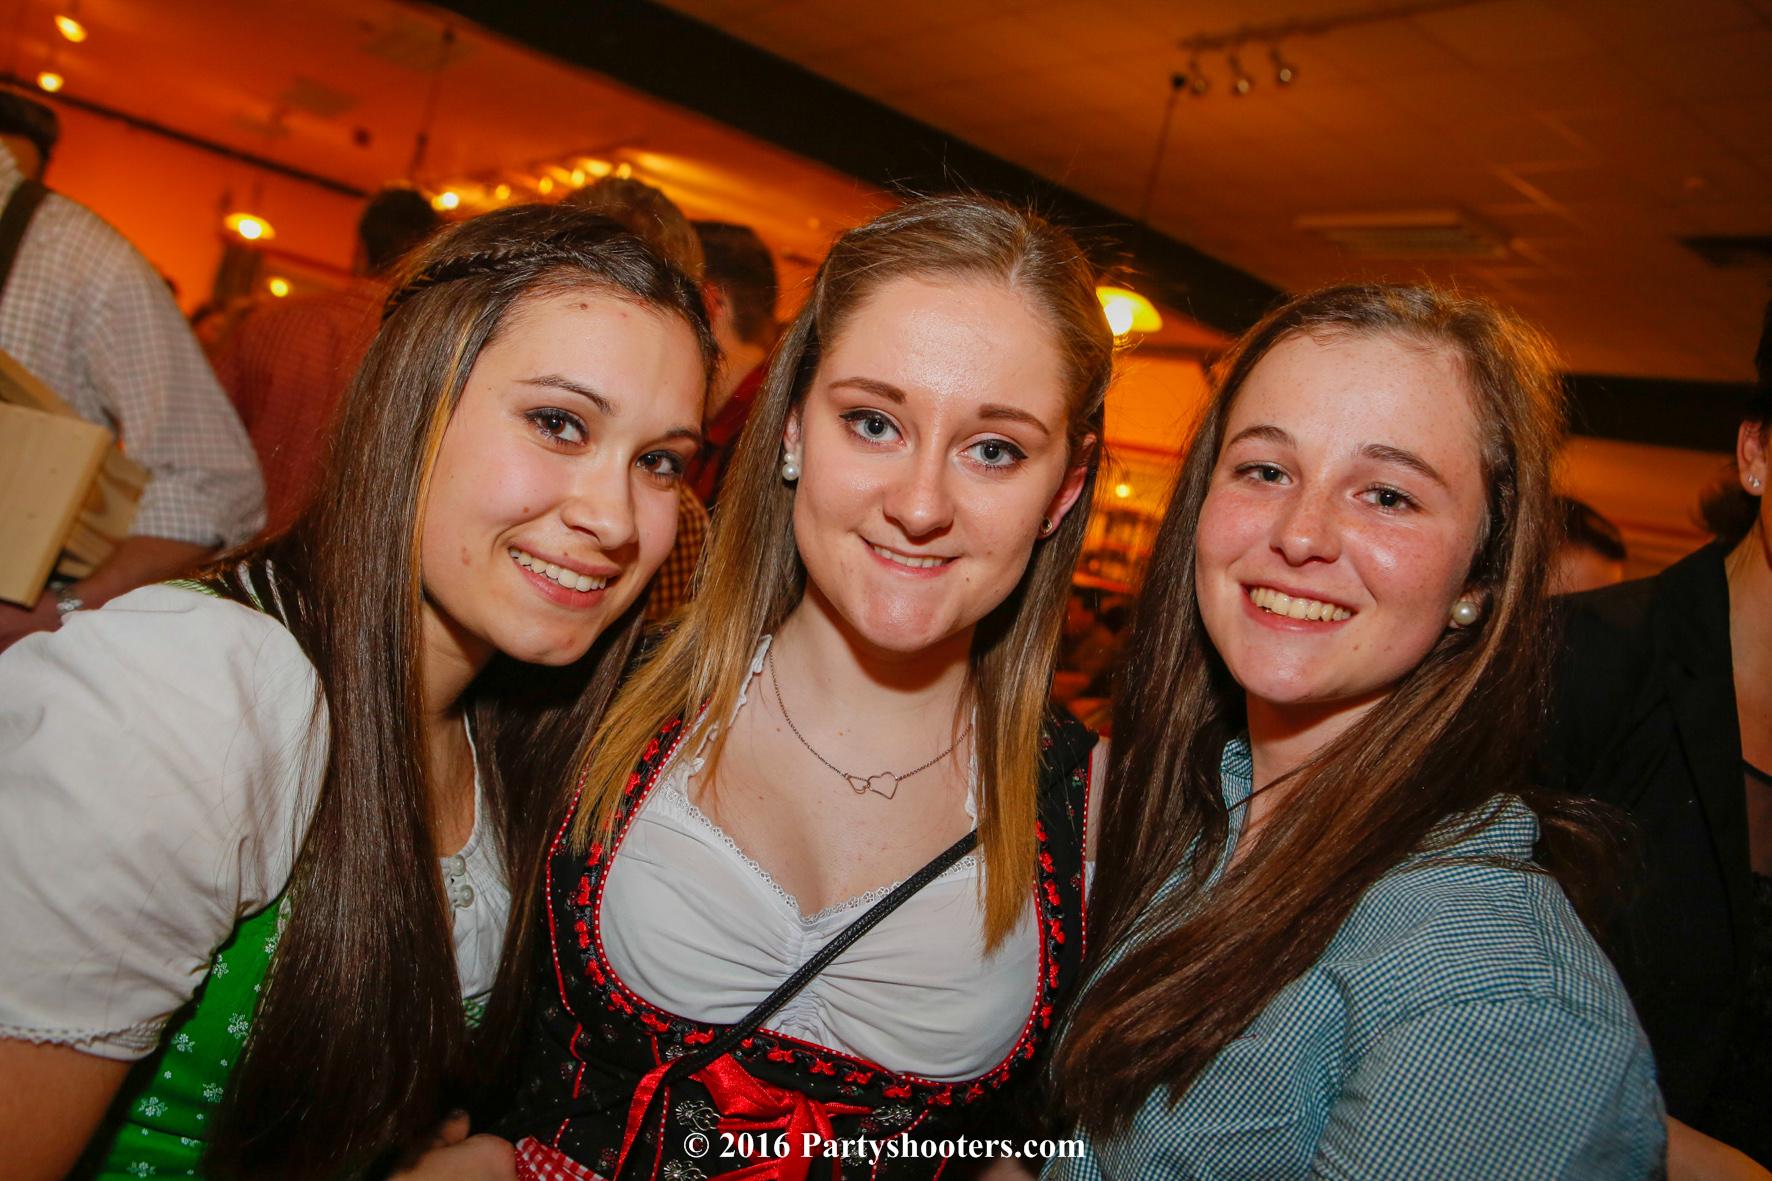 0103 - 4078 - Fruehlingsball Aspach